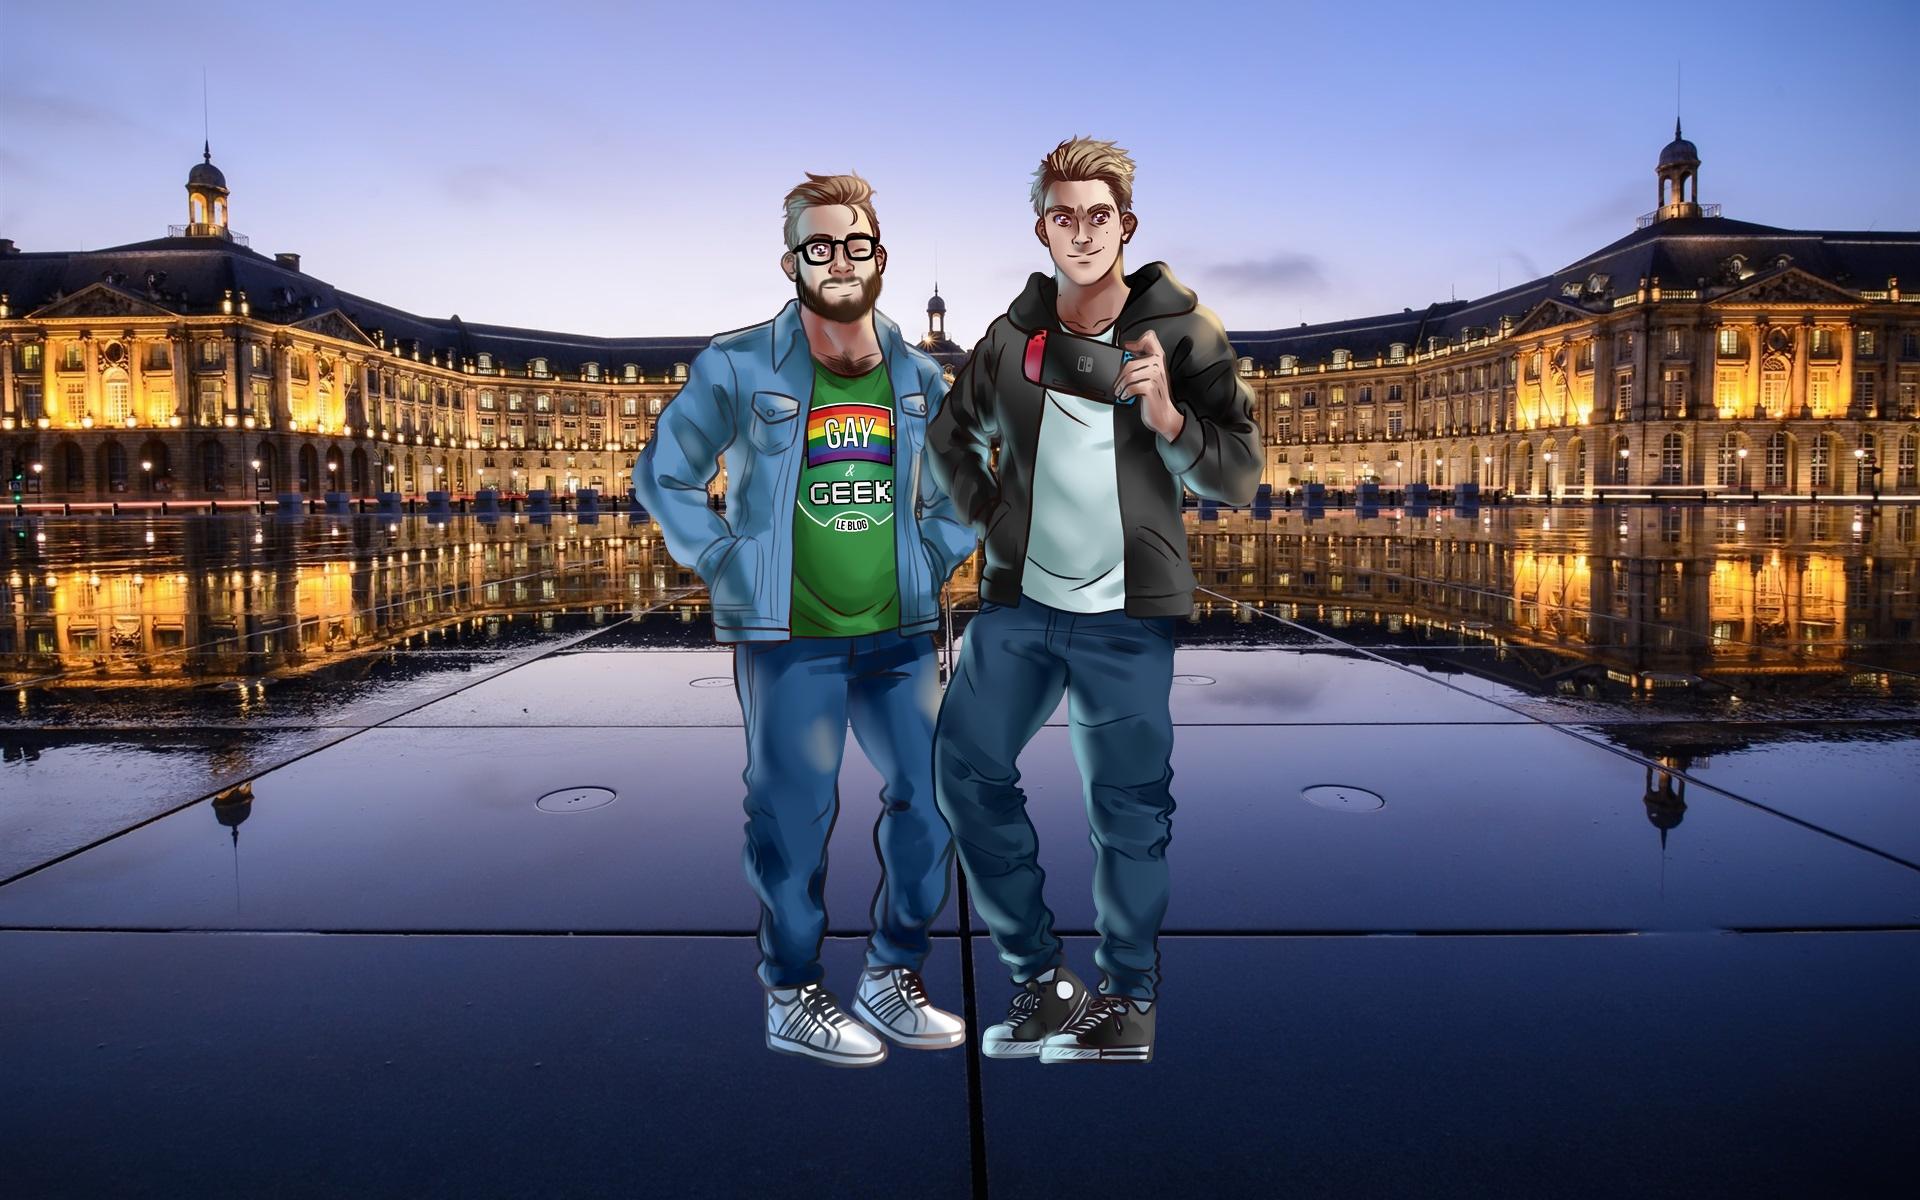 Gay and Geek – Bilan 2020 et projets 2021.